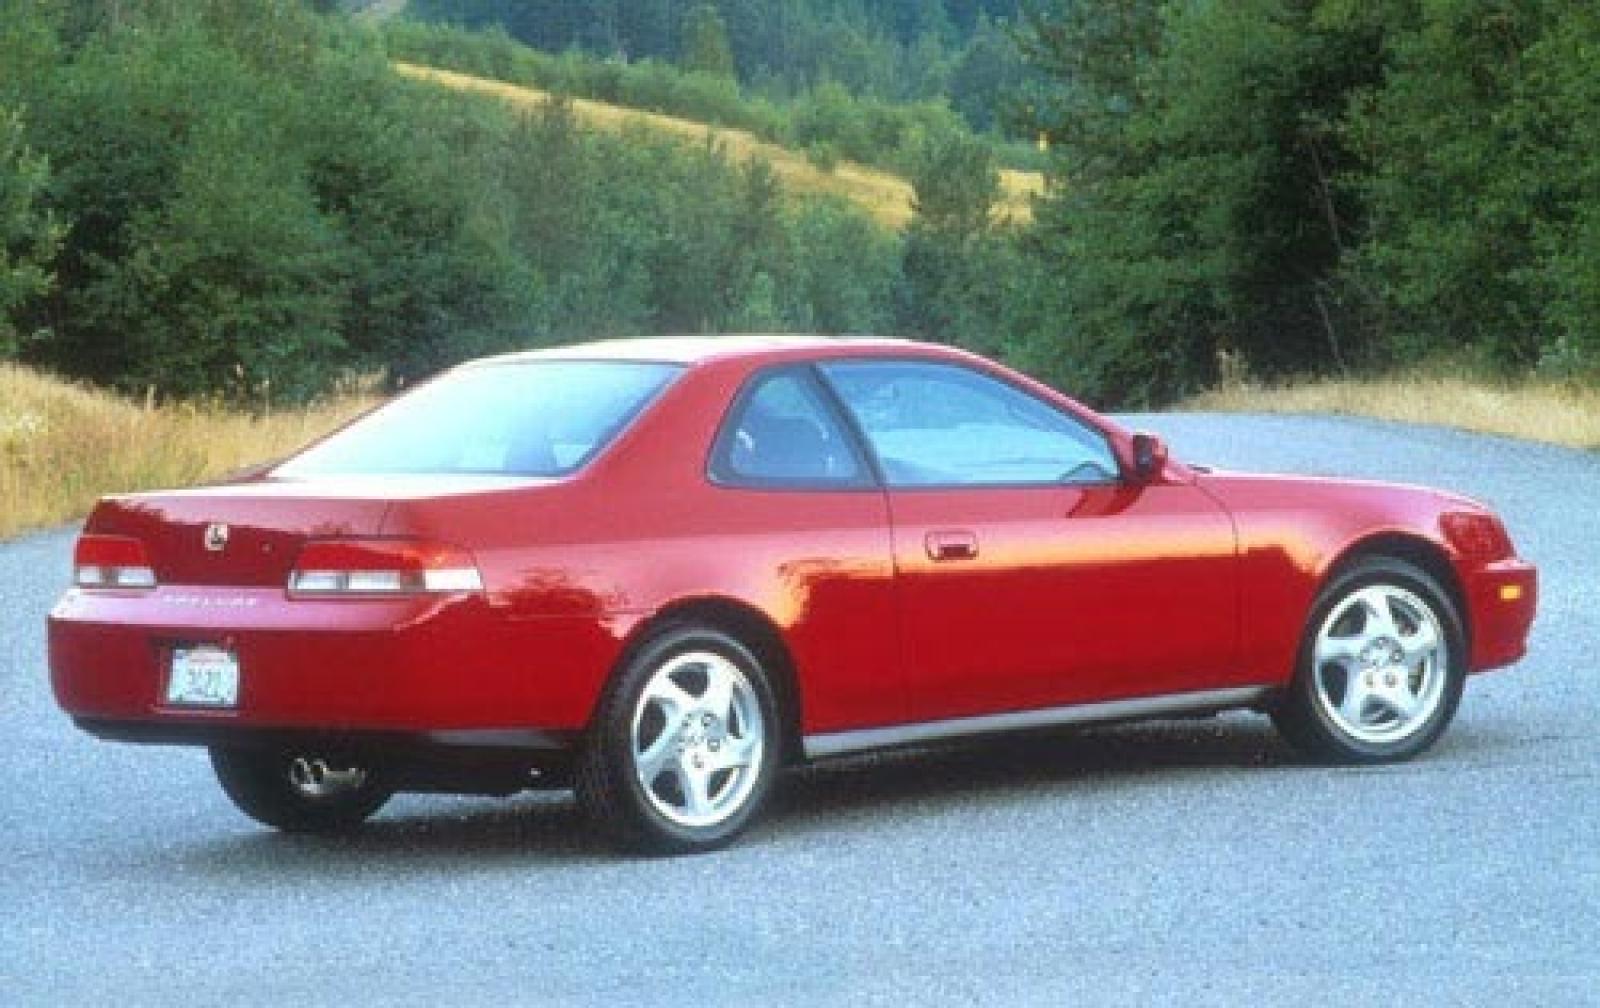 800 1024 1280 1600 origin 2000 Honda Prelude ...